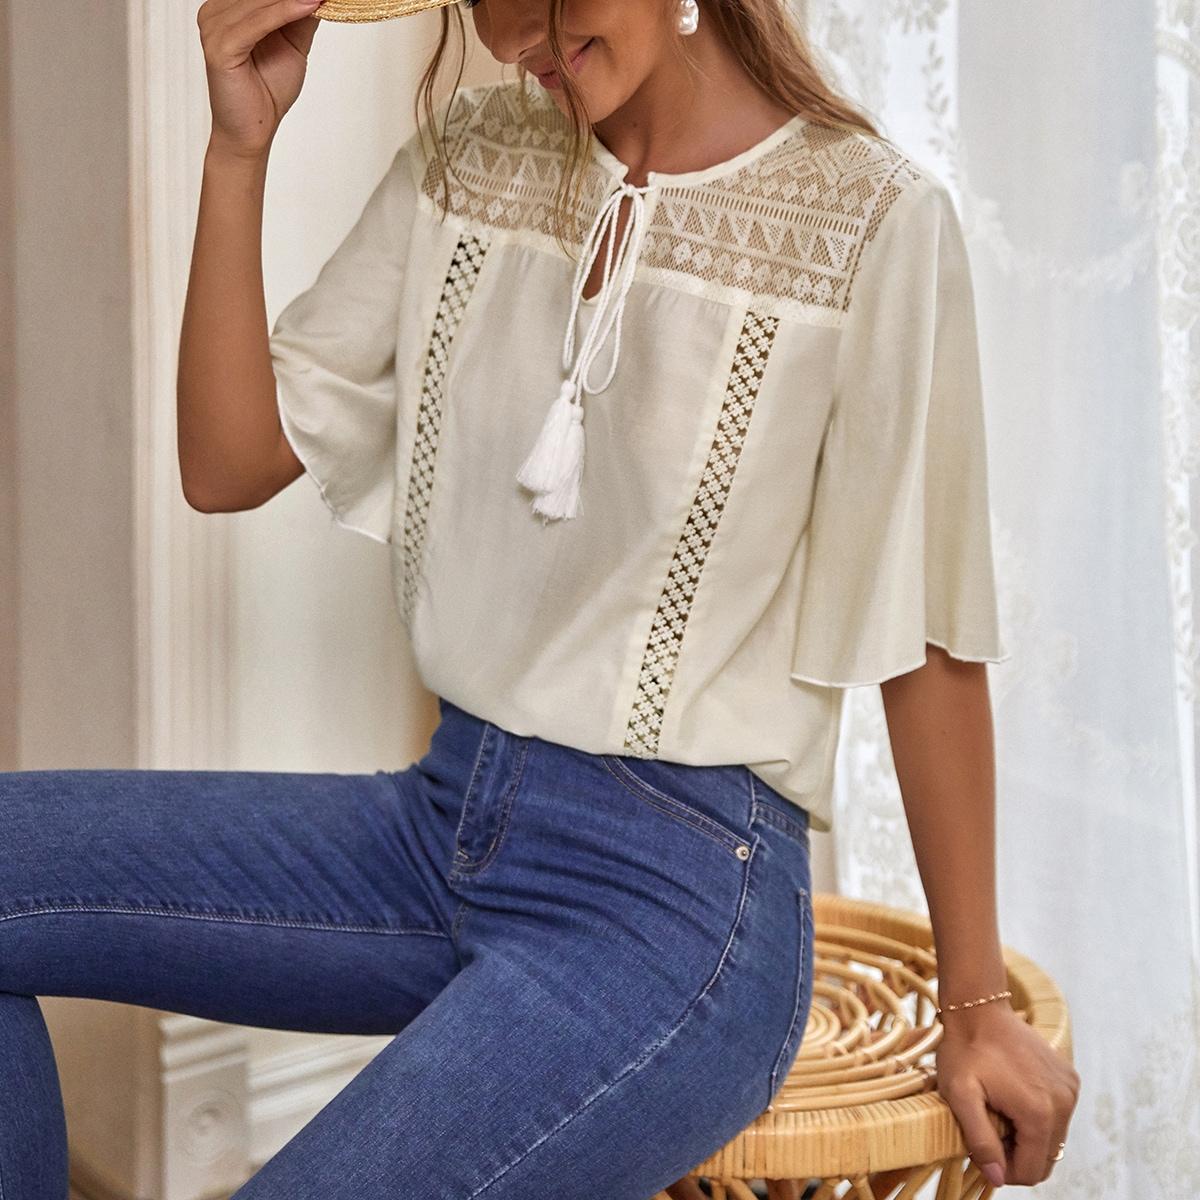 Блуза с кружевом SheIn swblouse44210417410